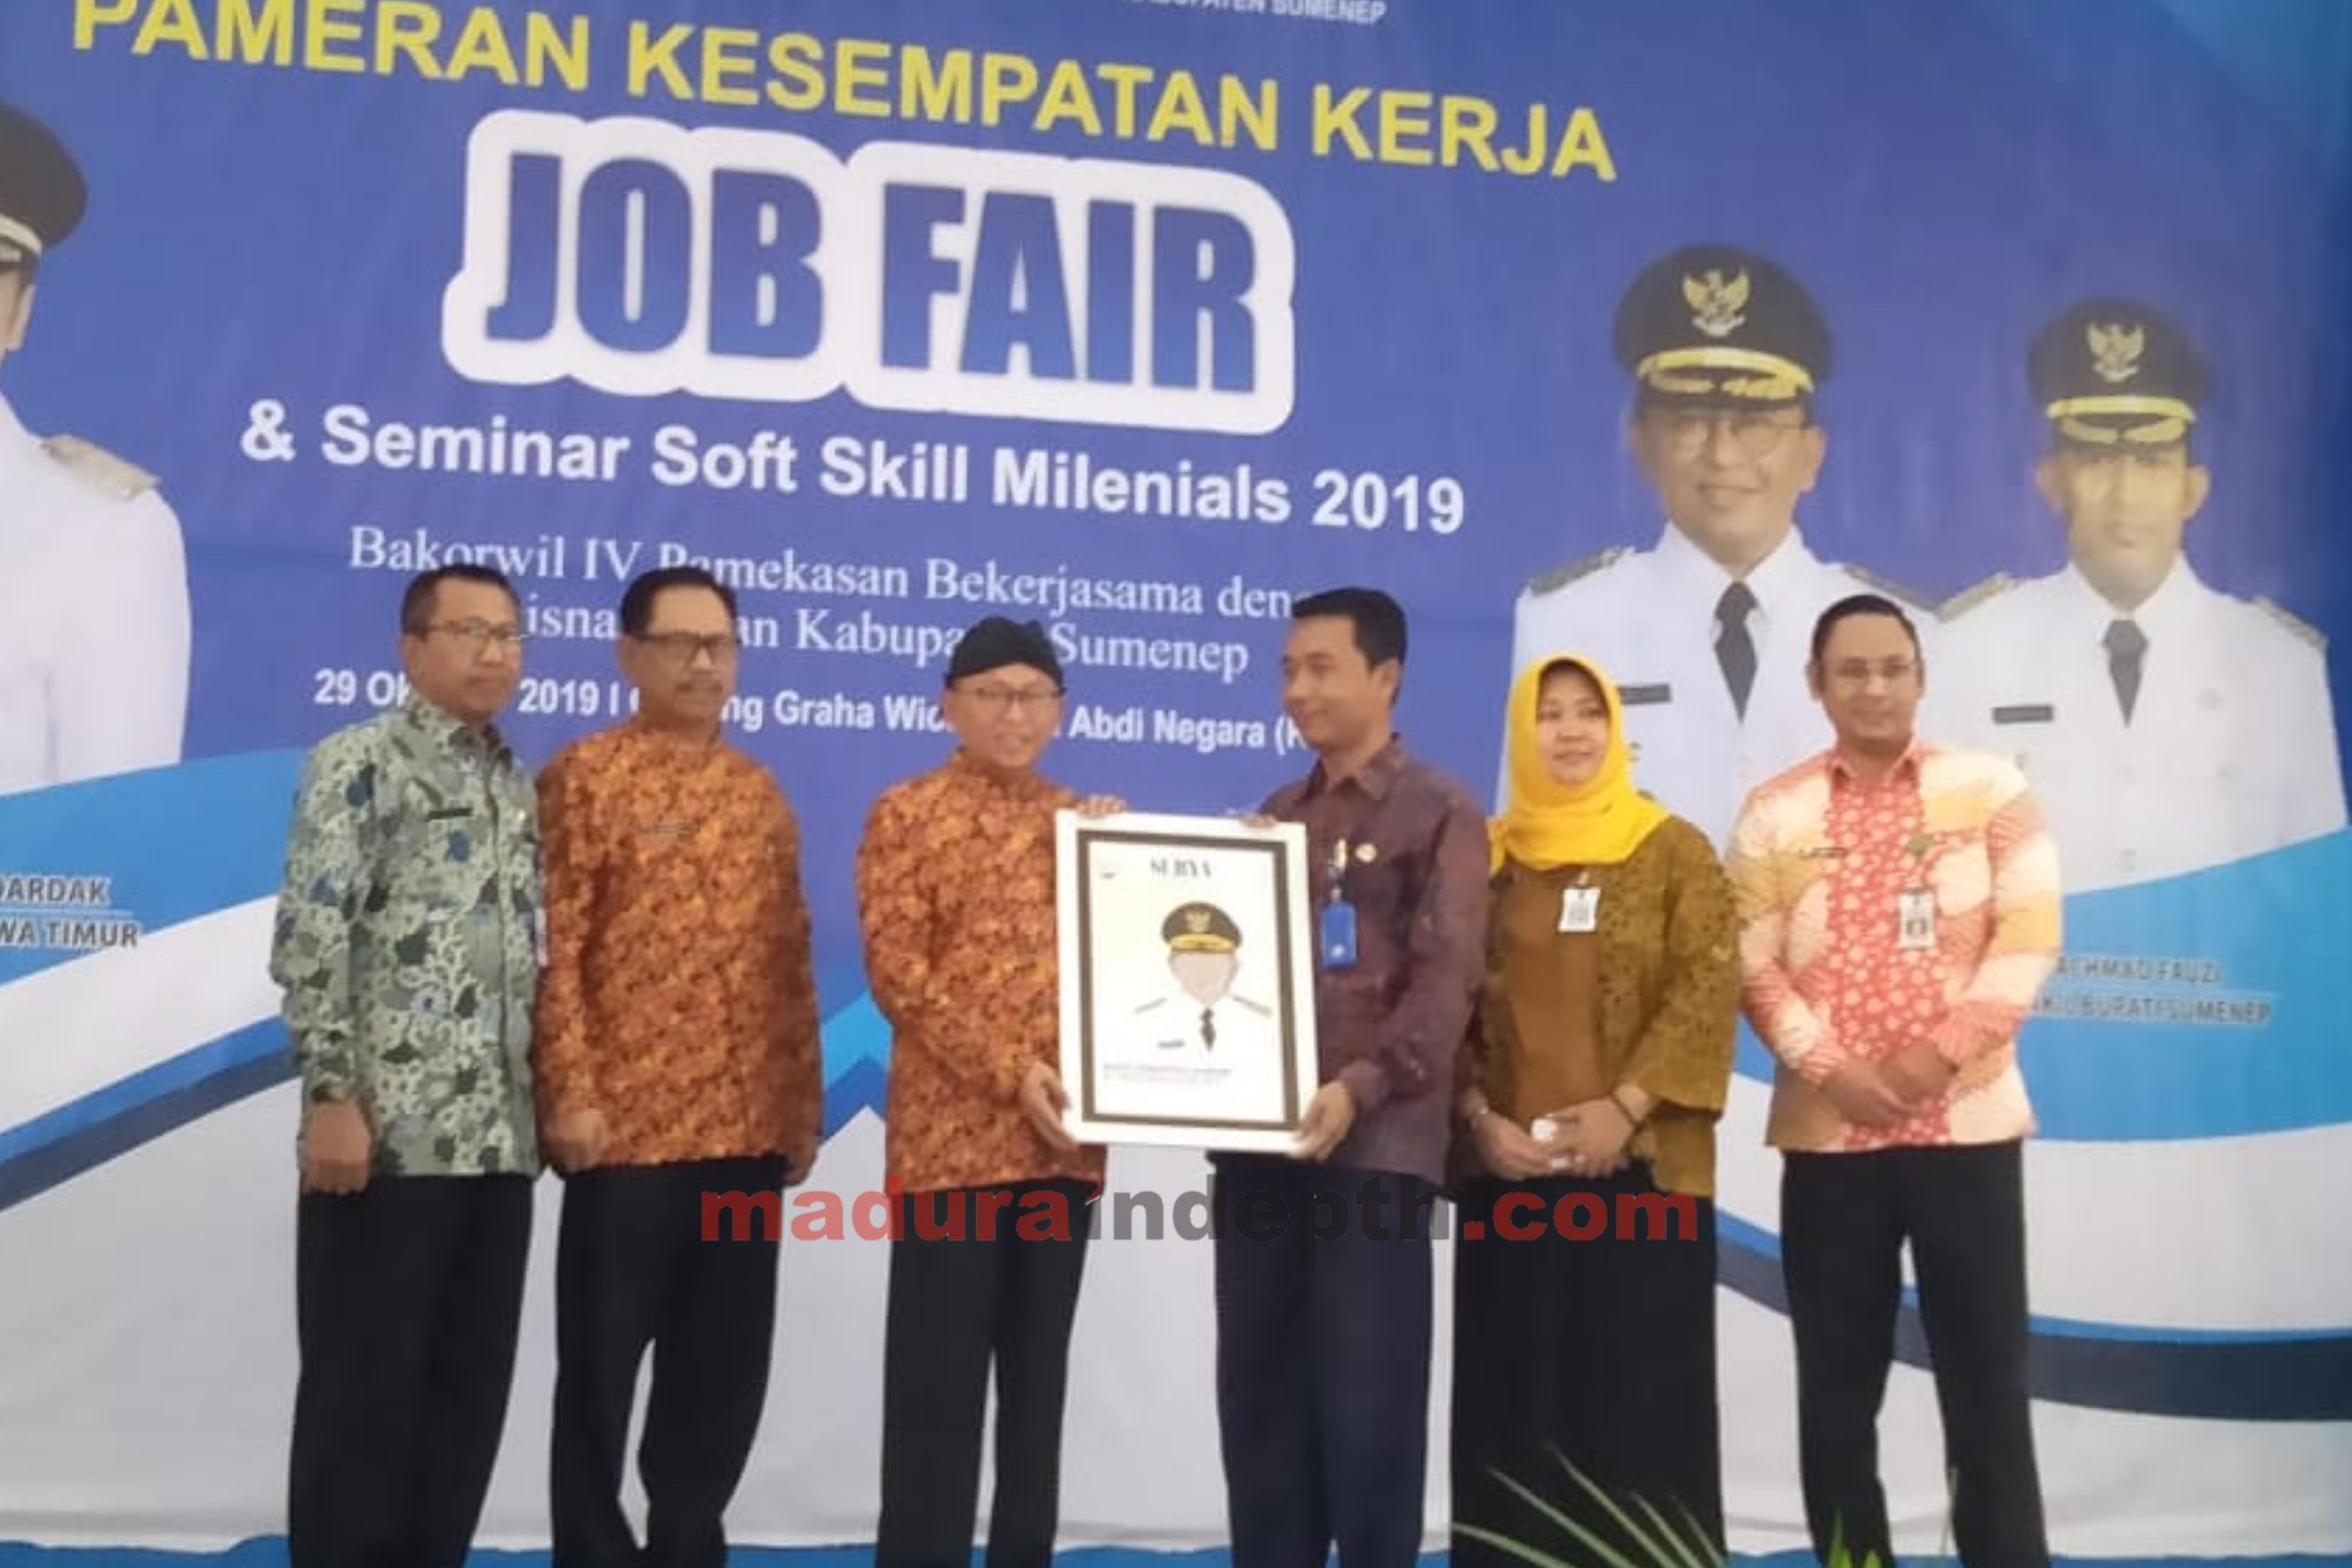 Jobfair Sumenep